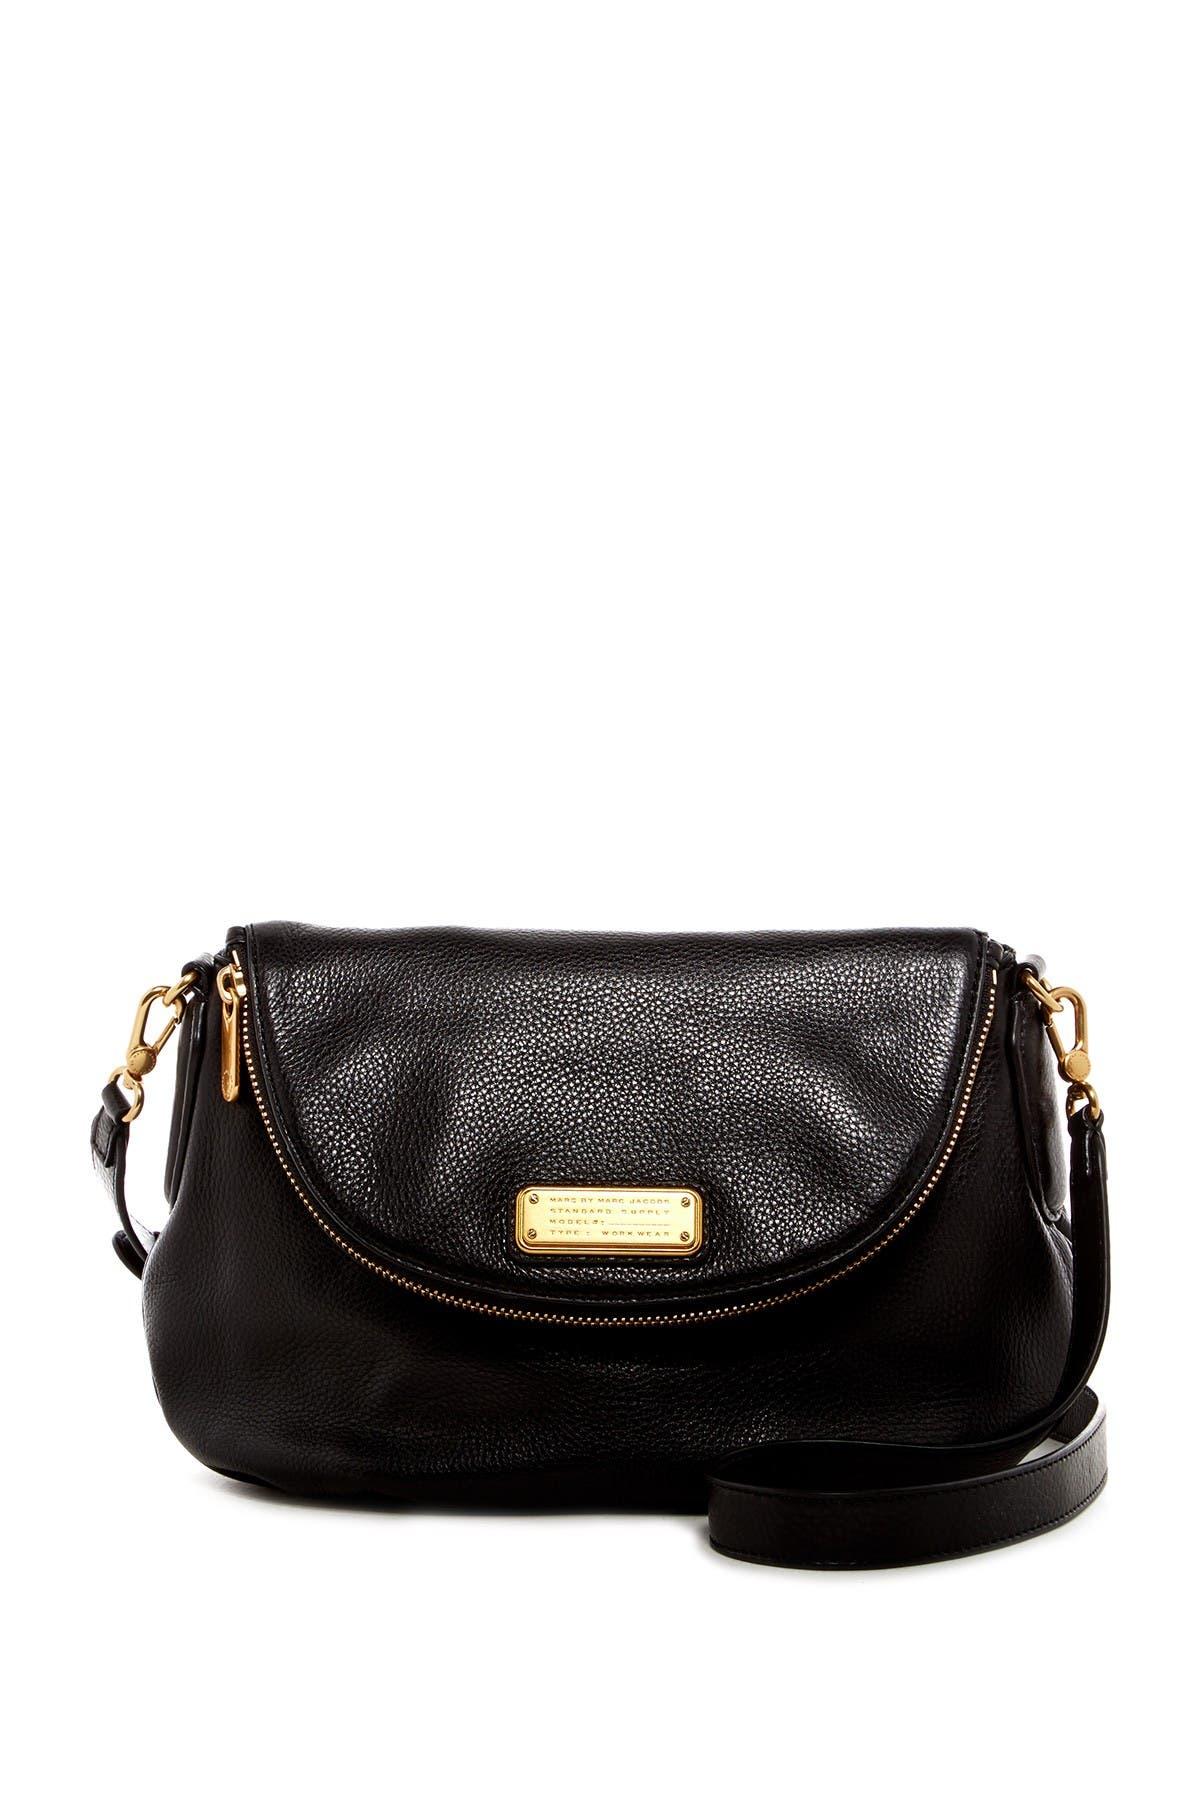 Image of Marc by Marc Jacobs Natasha Leather Crossbody Bag